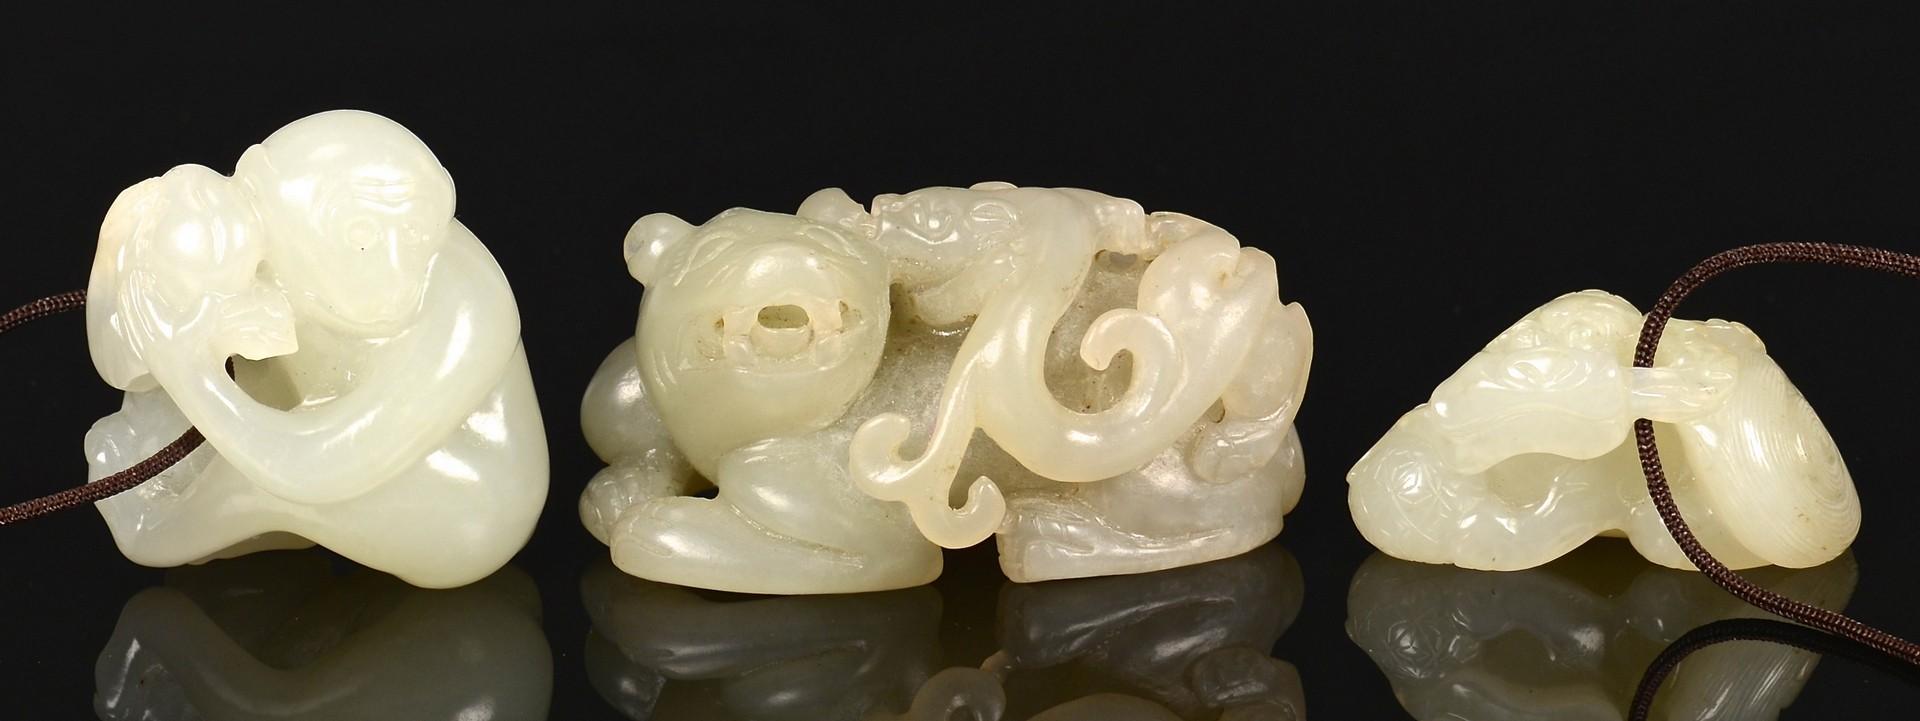 Lot 2: 3 Chinese Jade Animal Carvings